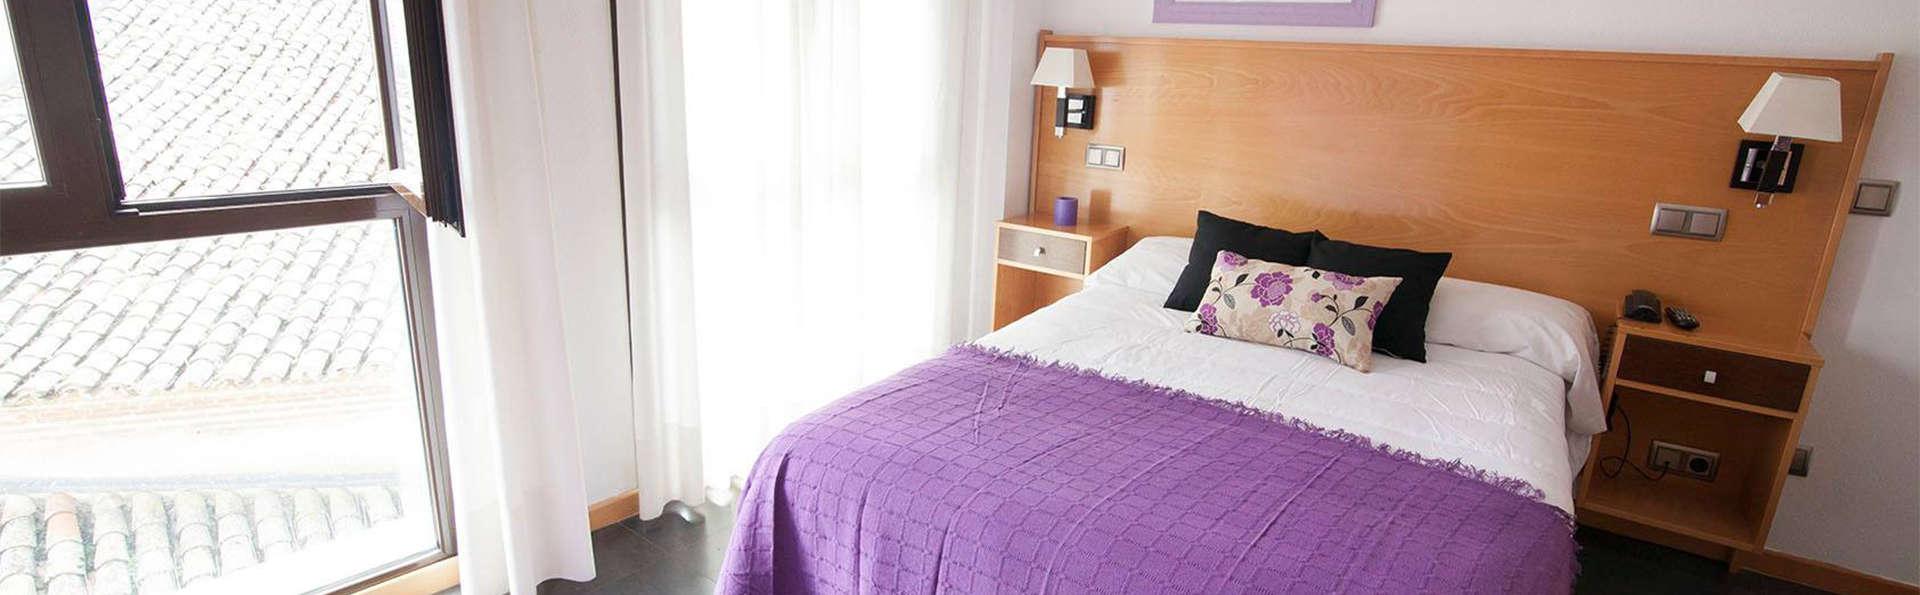 Hotel Real Illescas - EDIT_room30.jpg